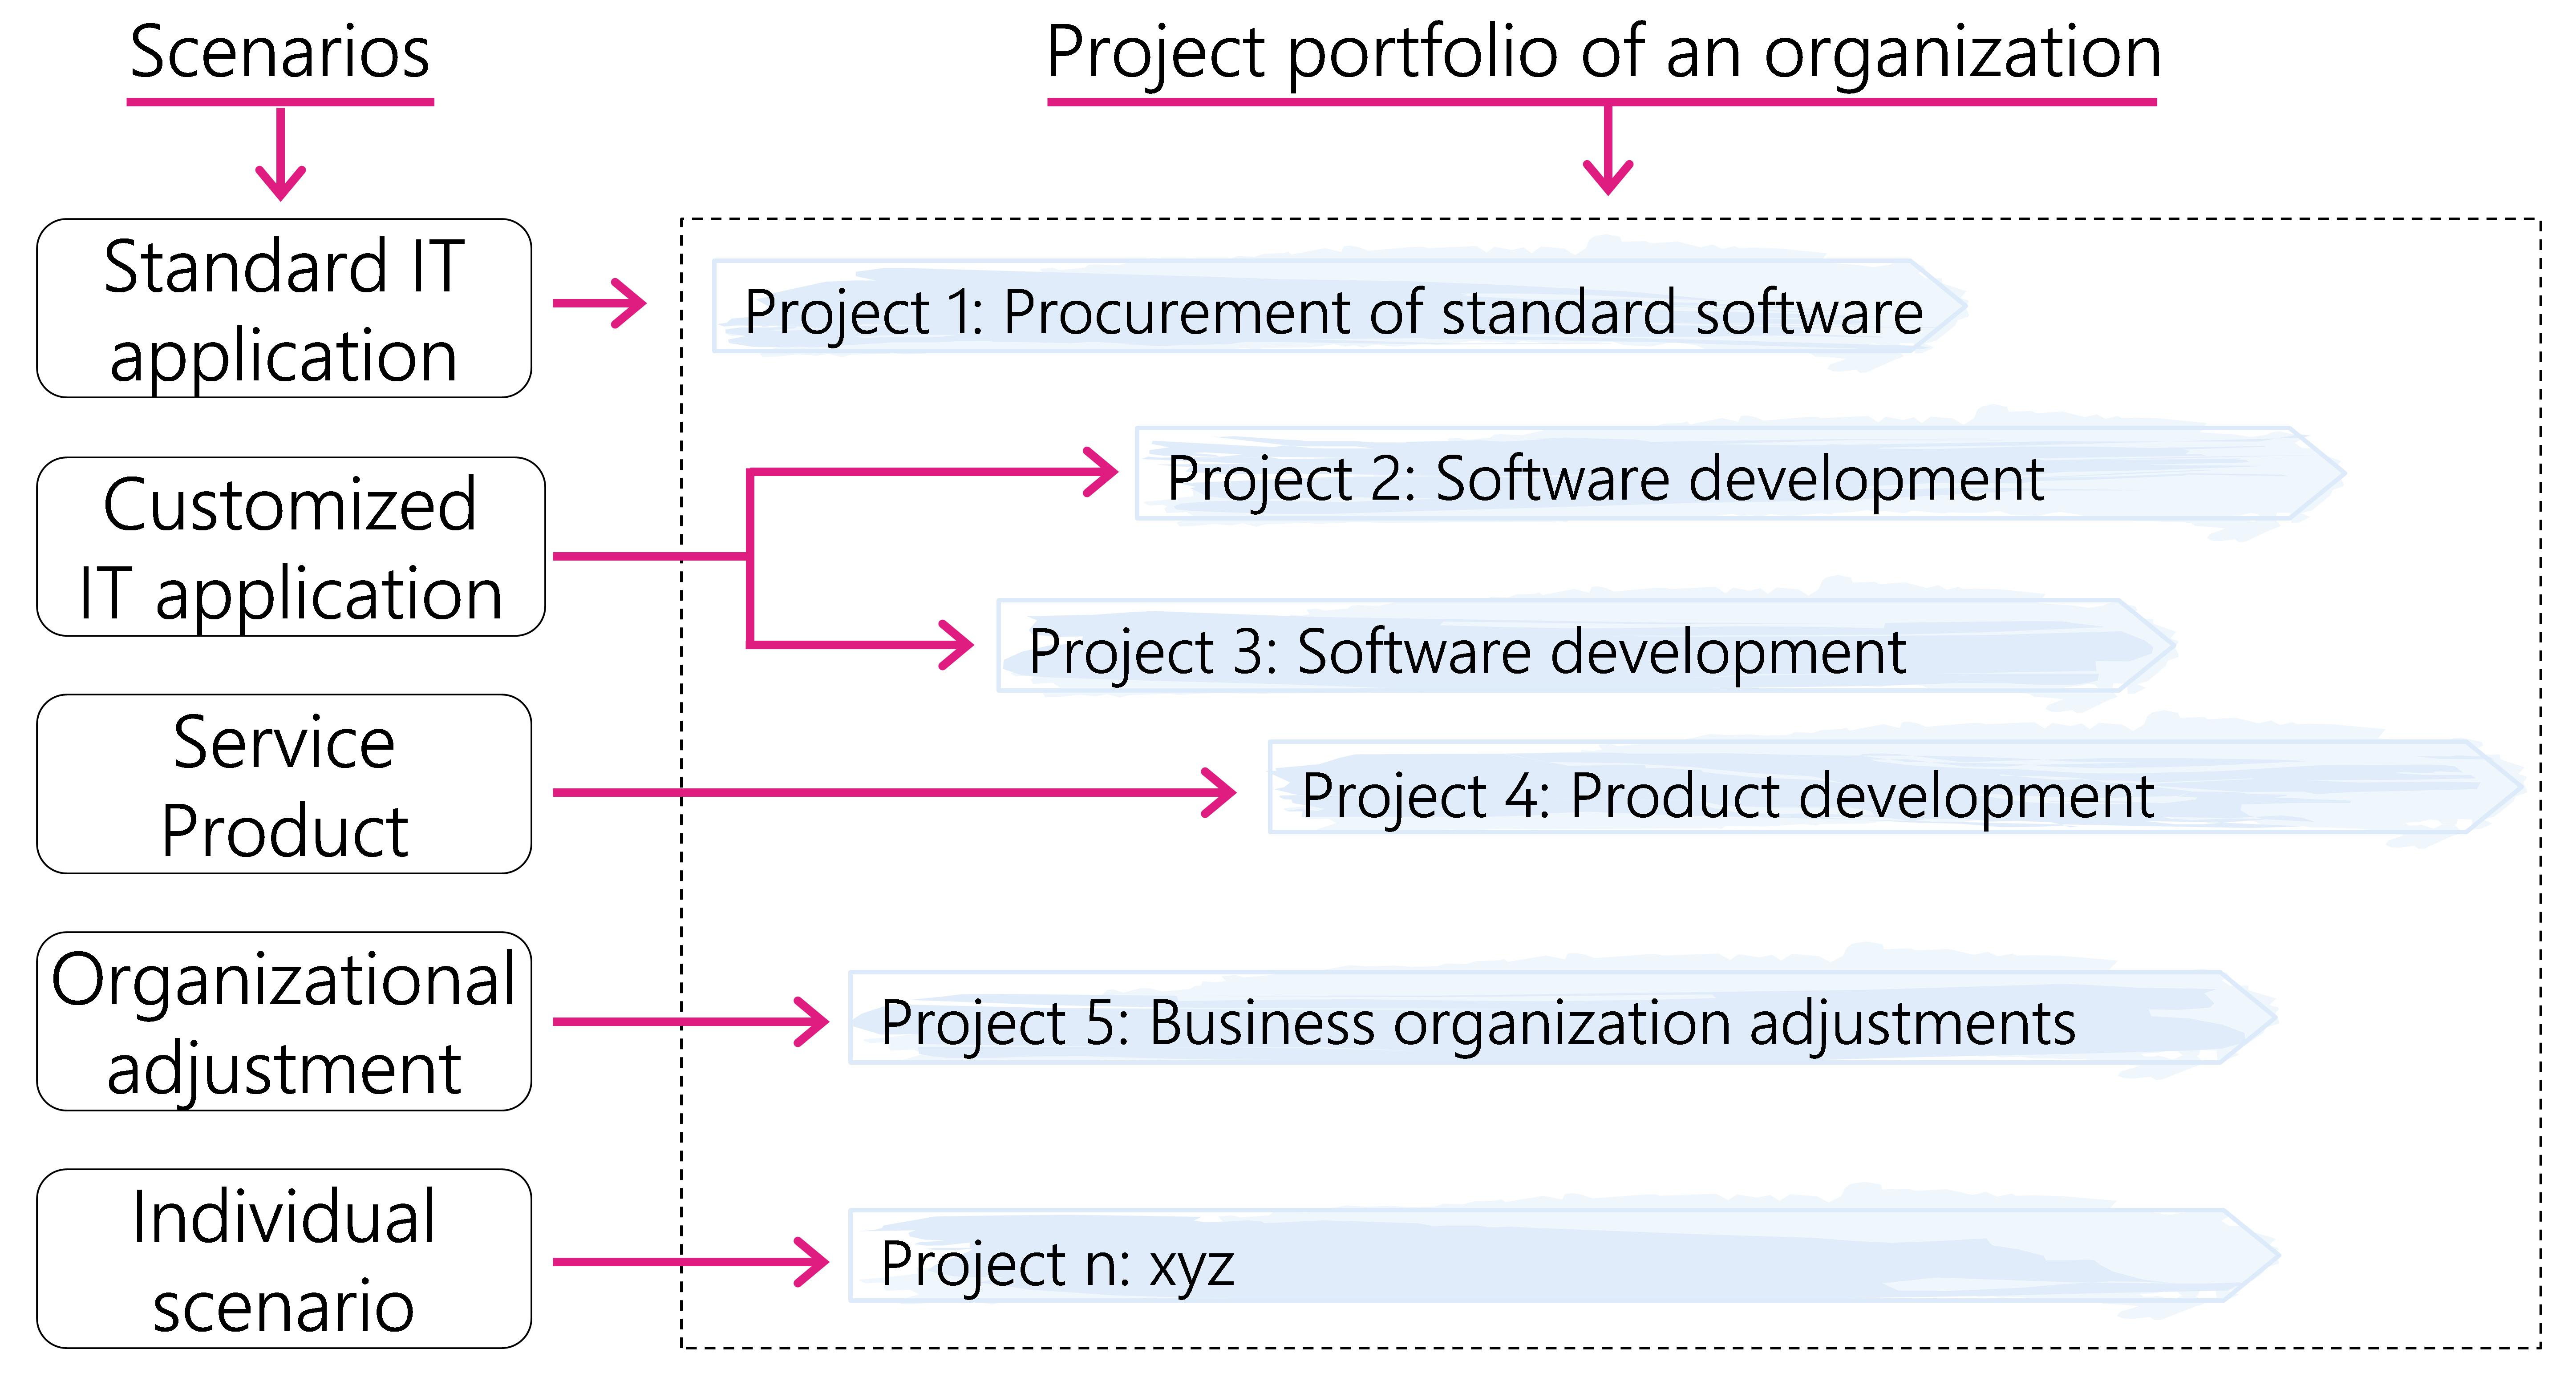 Figure1: Scenarios and project portfolio of an organization